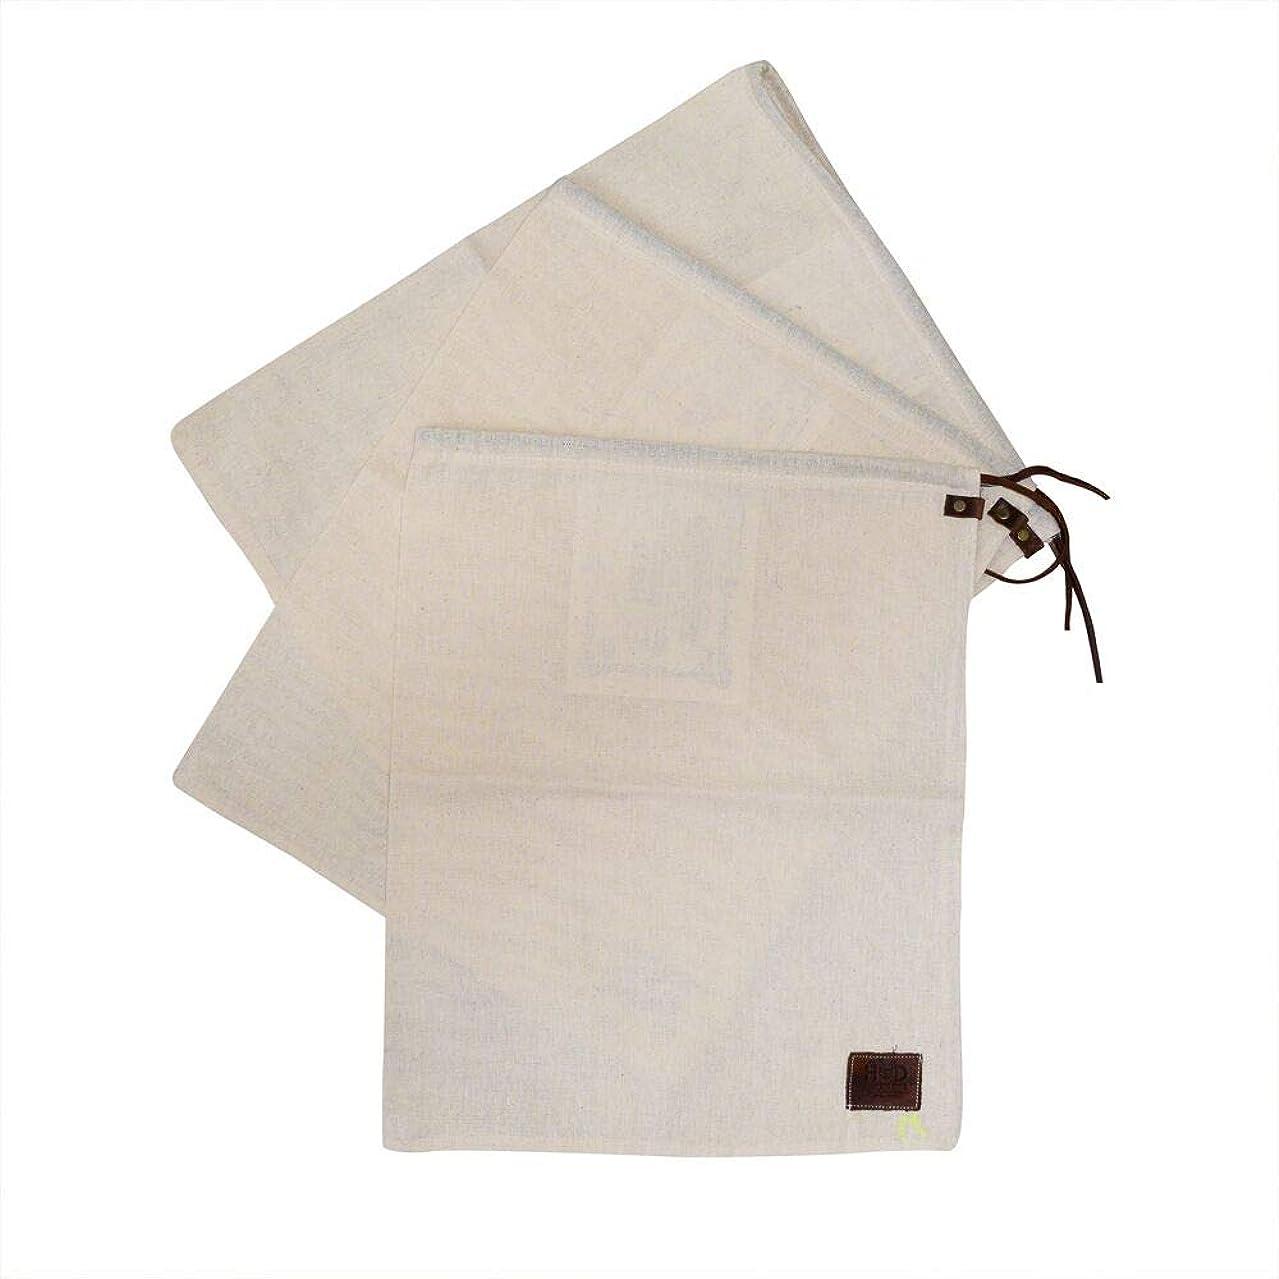 Hide & Drink, Manta Gift Bag (13.5 x 16.5 in.) (3 Pack) / Packing/Storage/Organizer/Vintage/Shopping, Handmade Includes 101 Year Warranty :: Manta